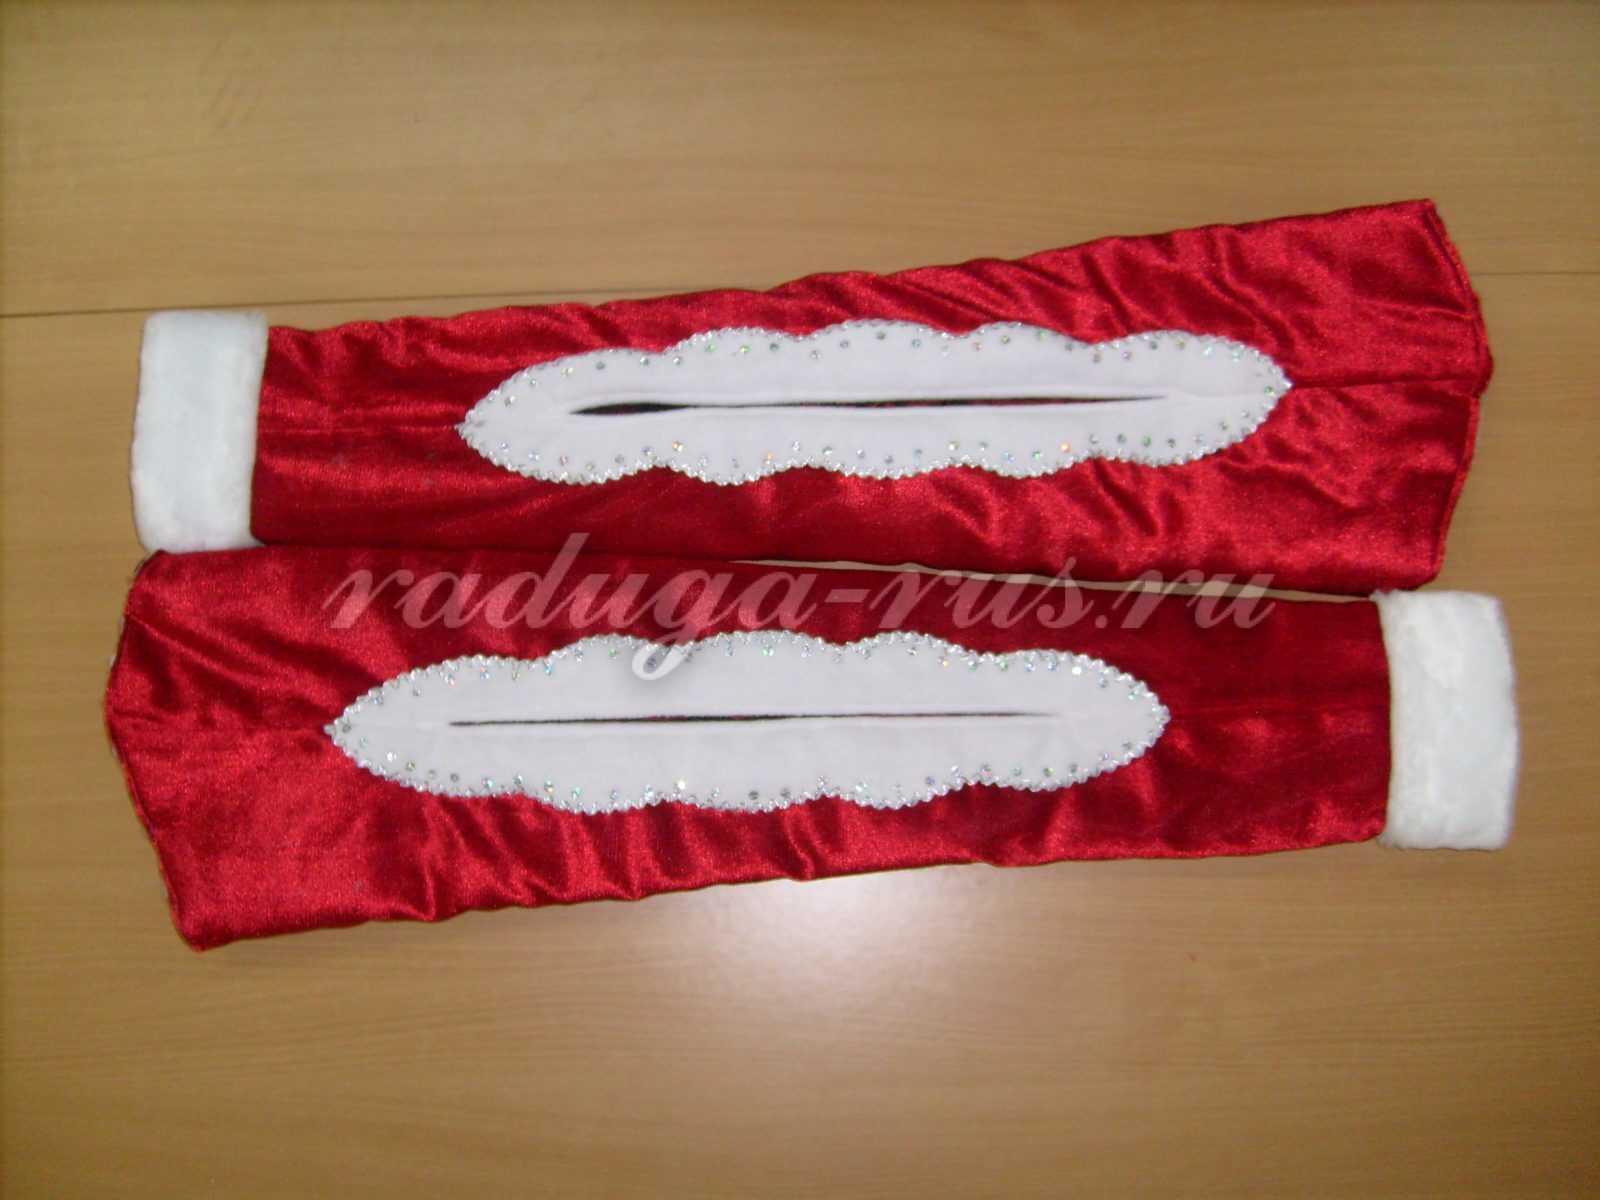 обработка рукавов шубы костюма Деда Мороза